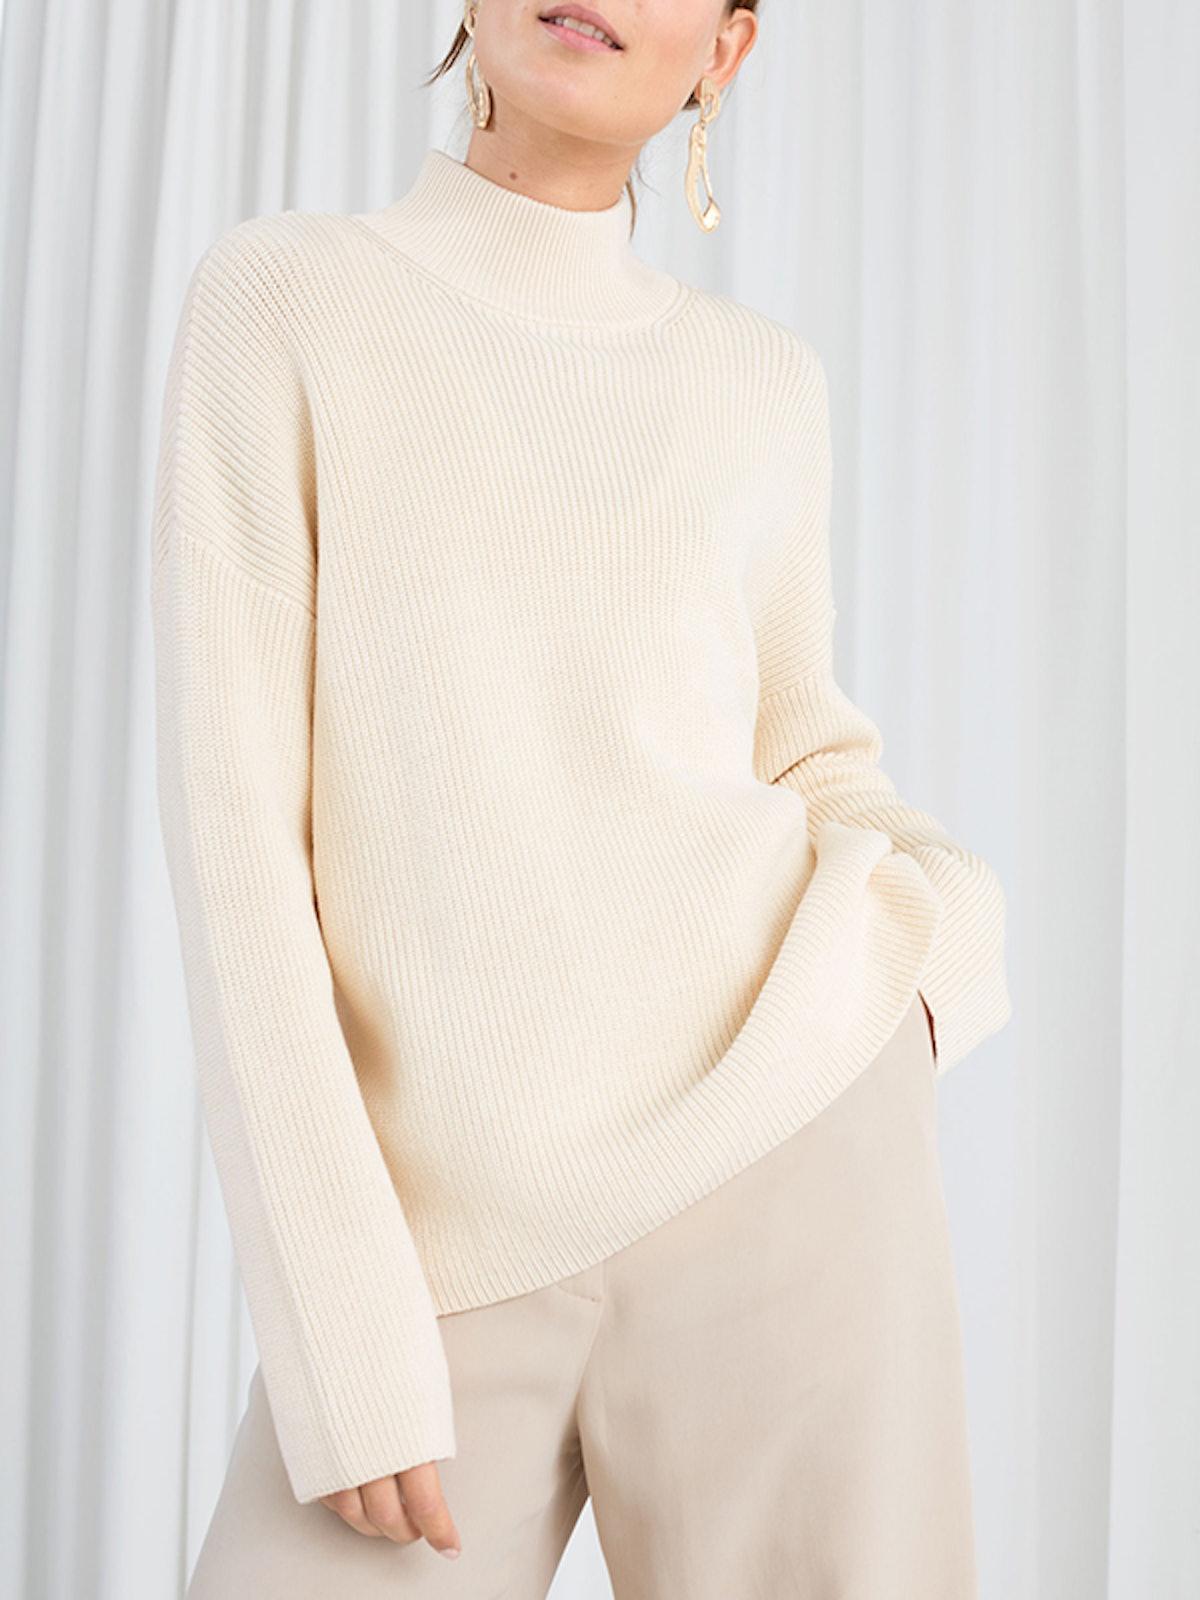 Cotton Blend Mock Neck Sweater